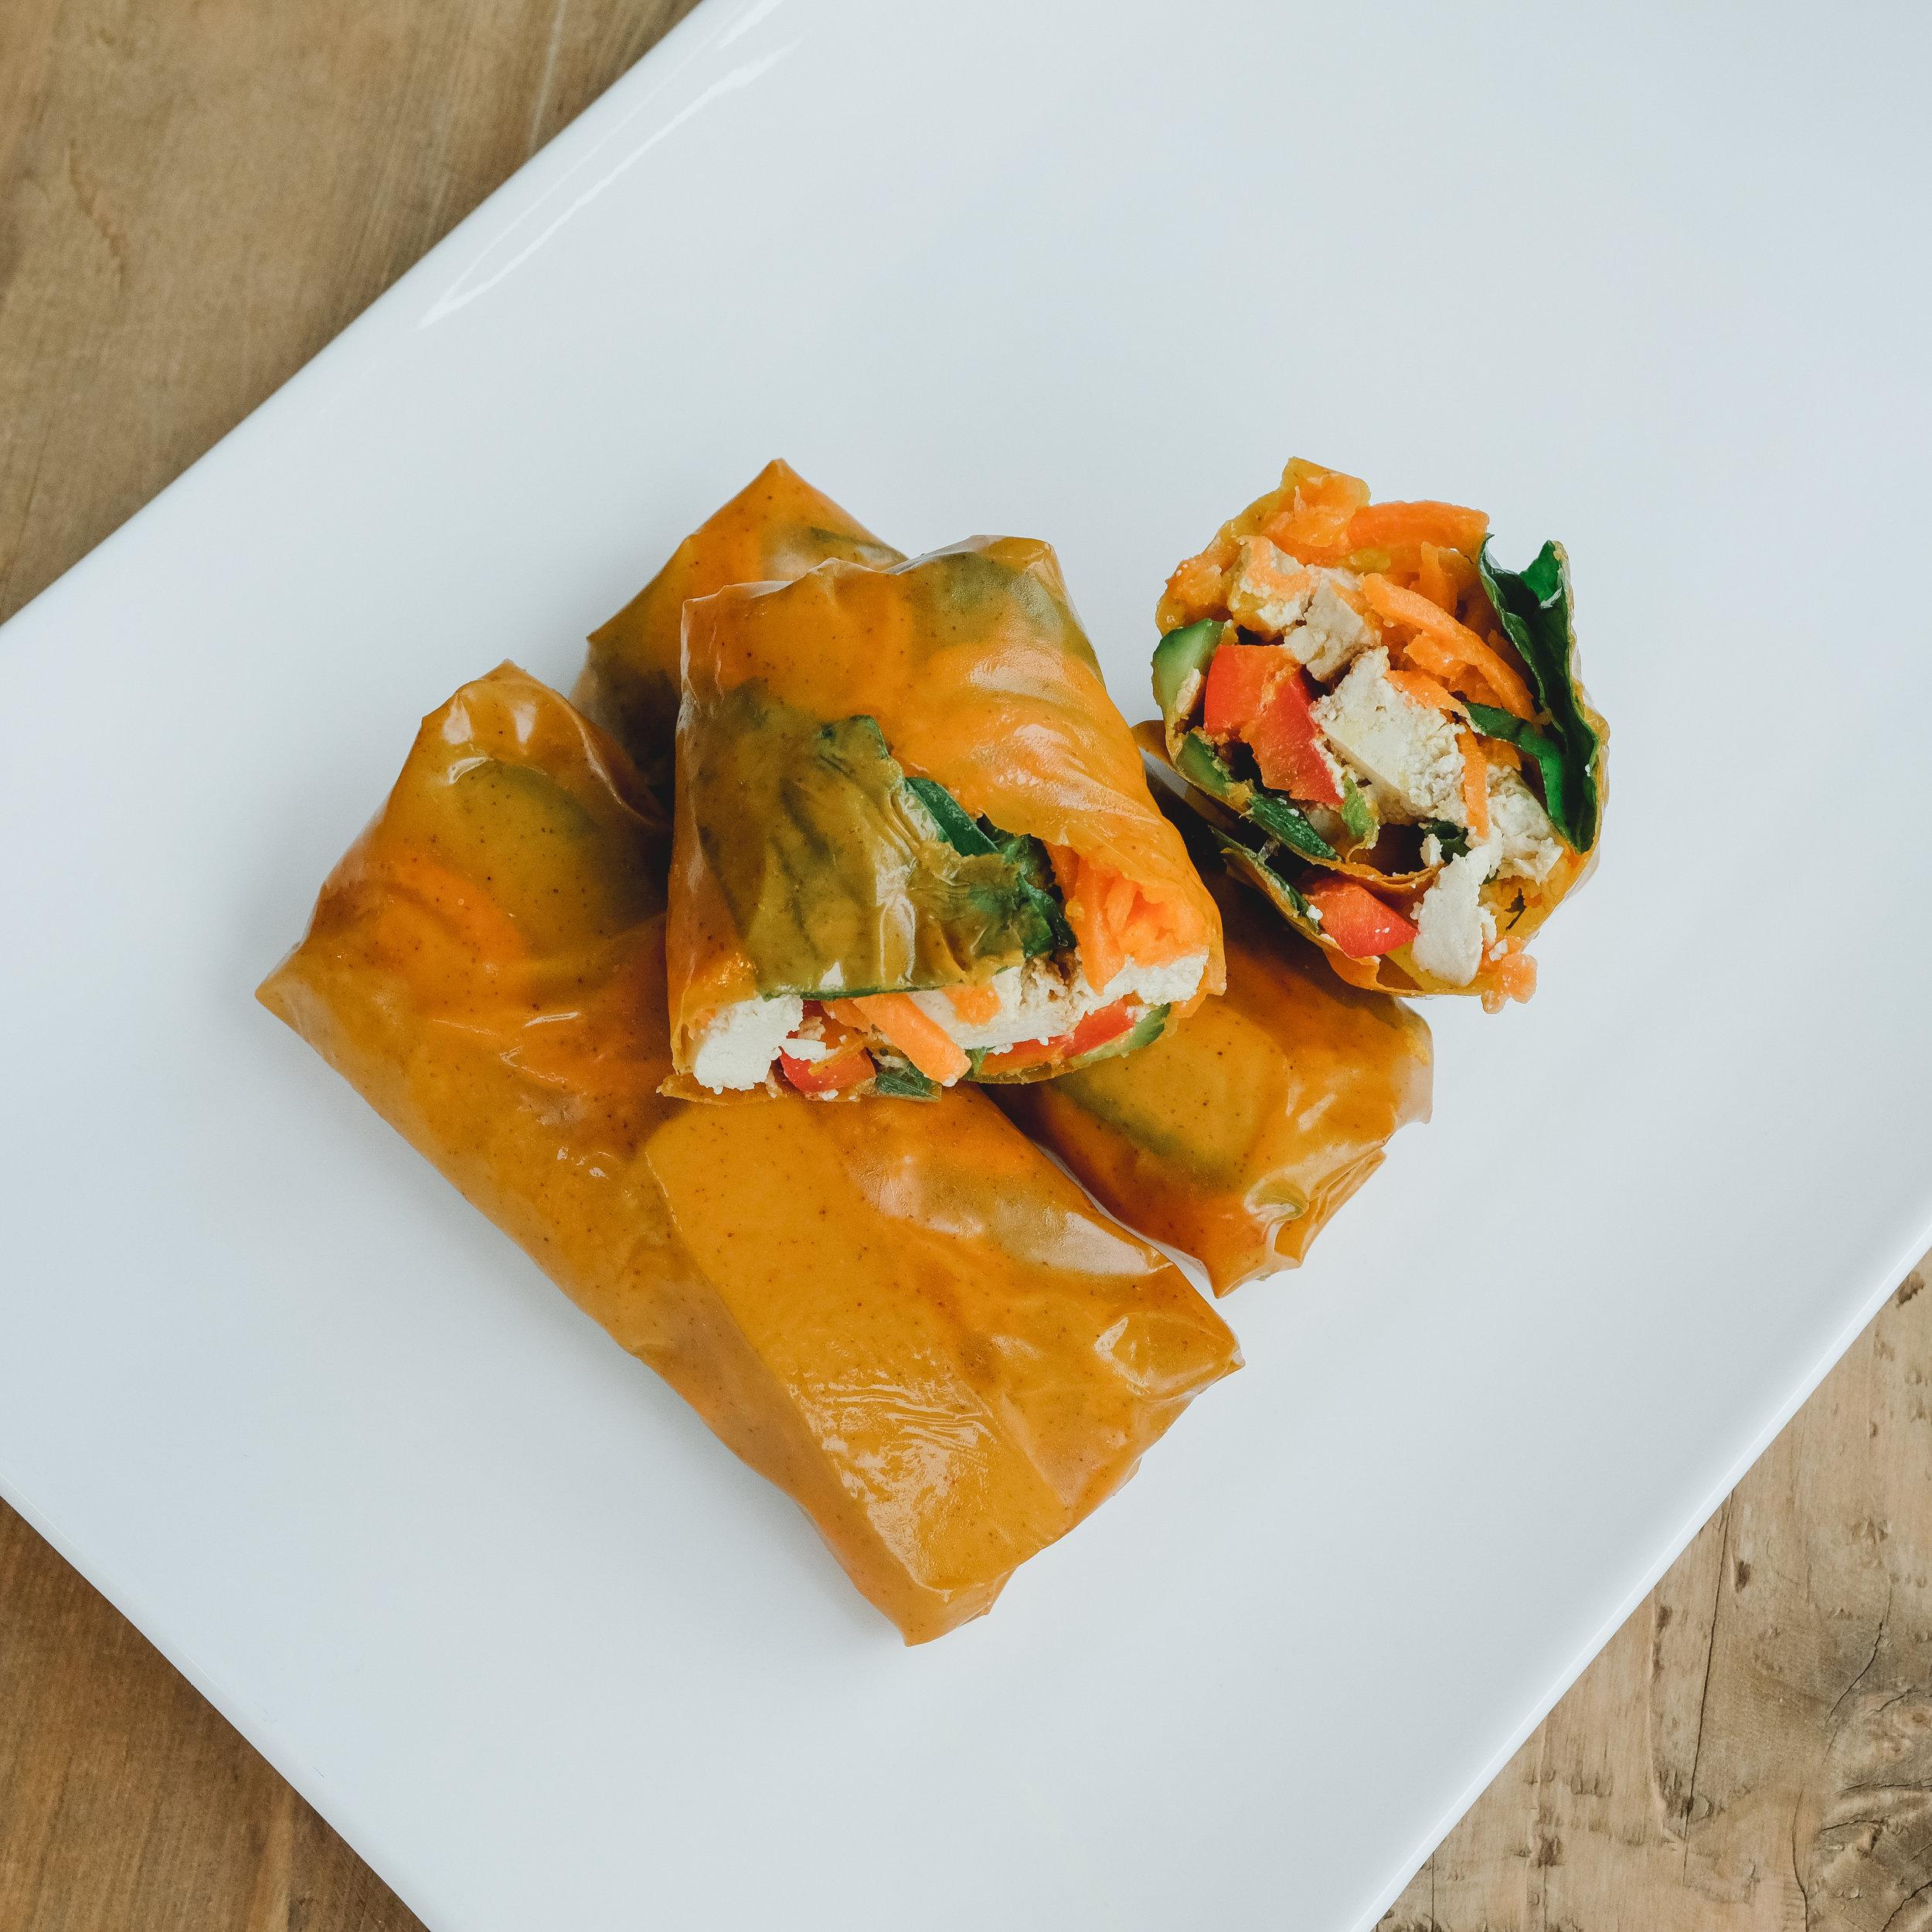 FreedFit-Lunch-Mango wrap veggie rolls-11.jpg